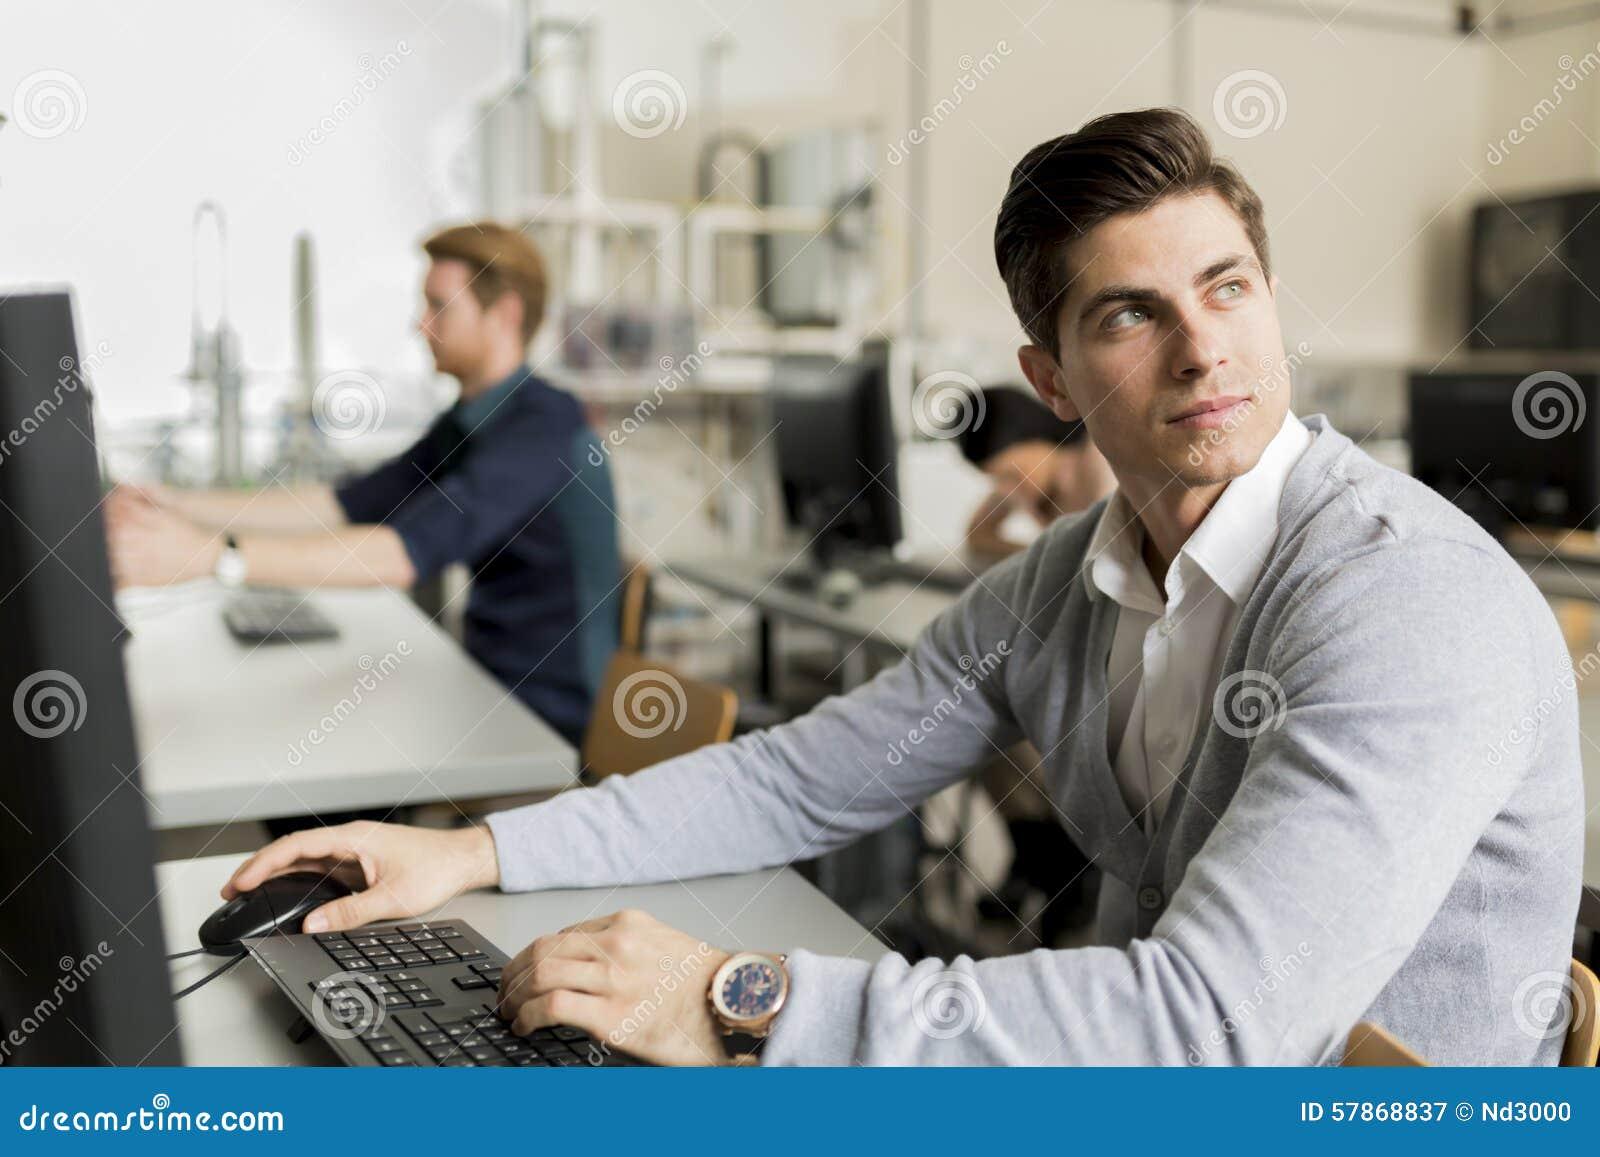 Jonge knappe student die computer met behulp van